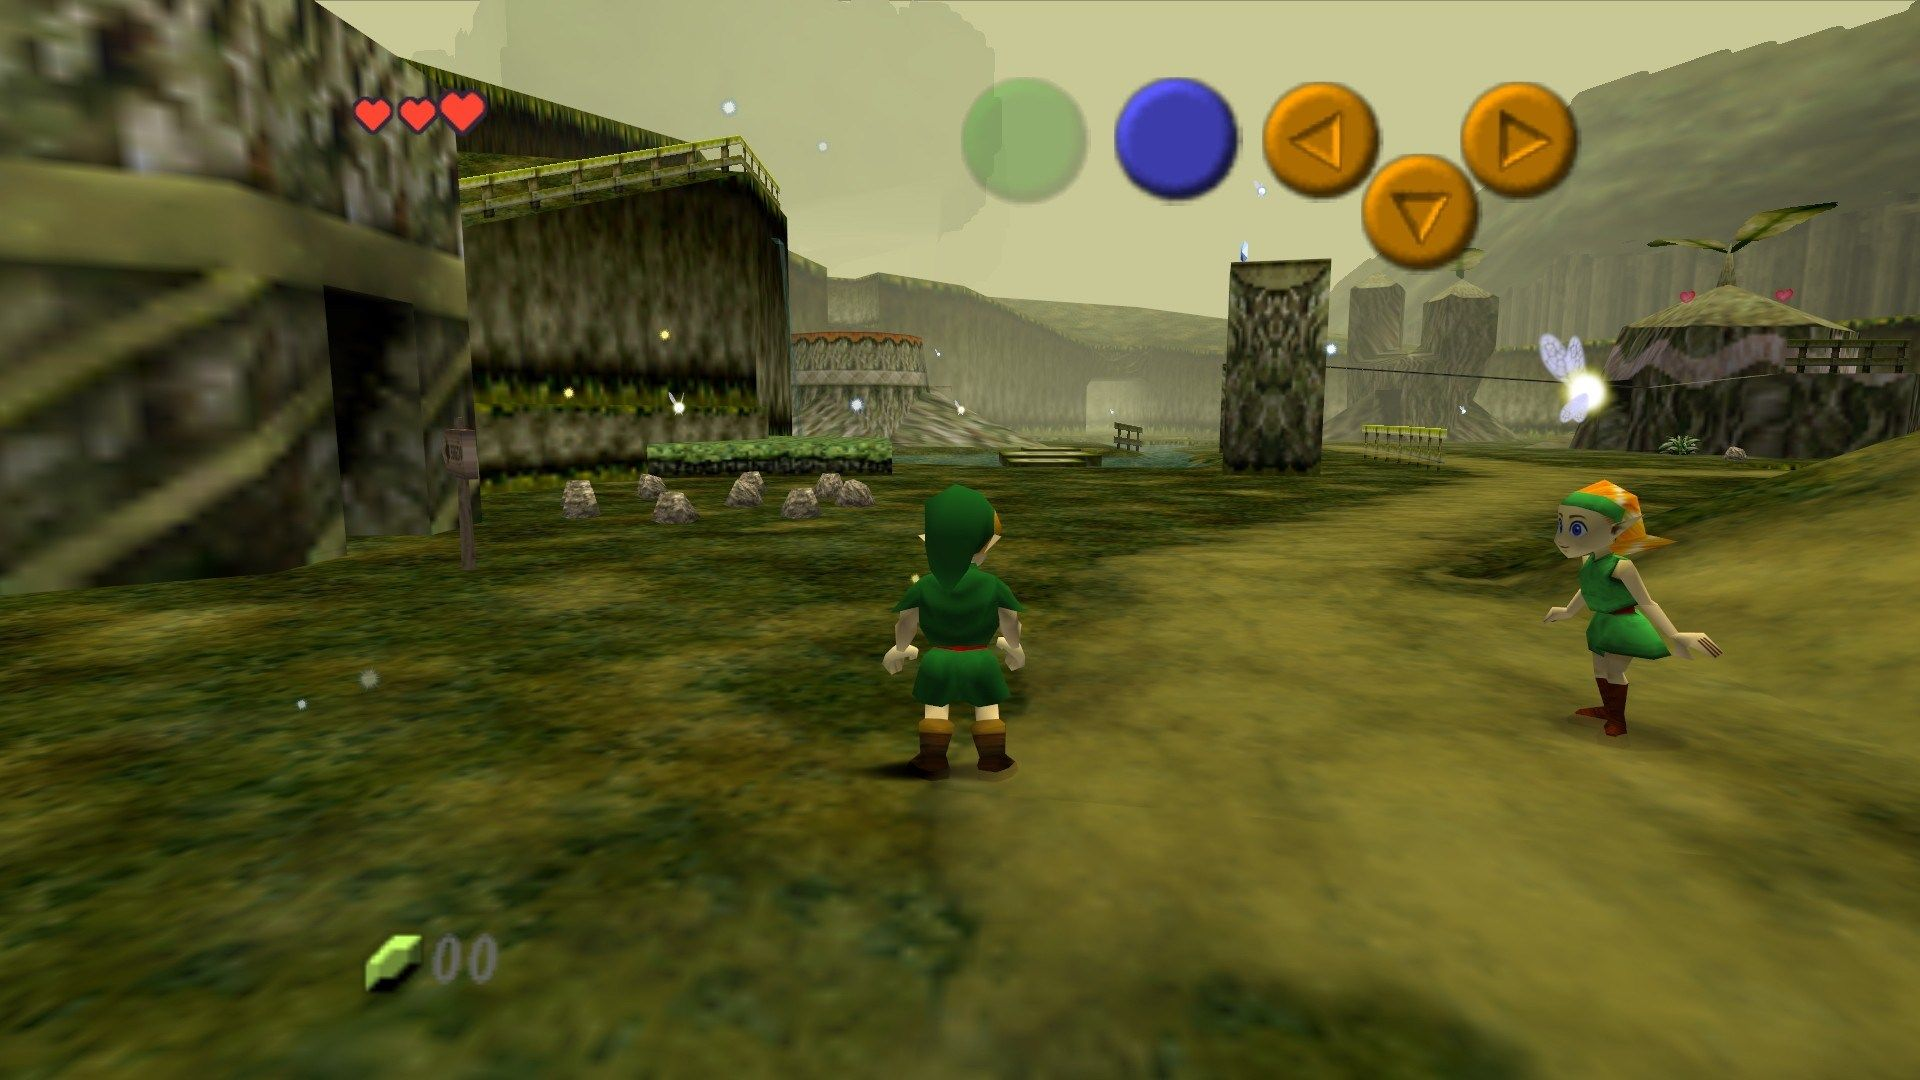 1920x1080 Awesome The Legend Of Zelda Ocarina Of Time Jpg 256 Kb